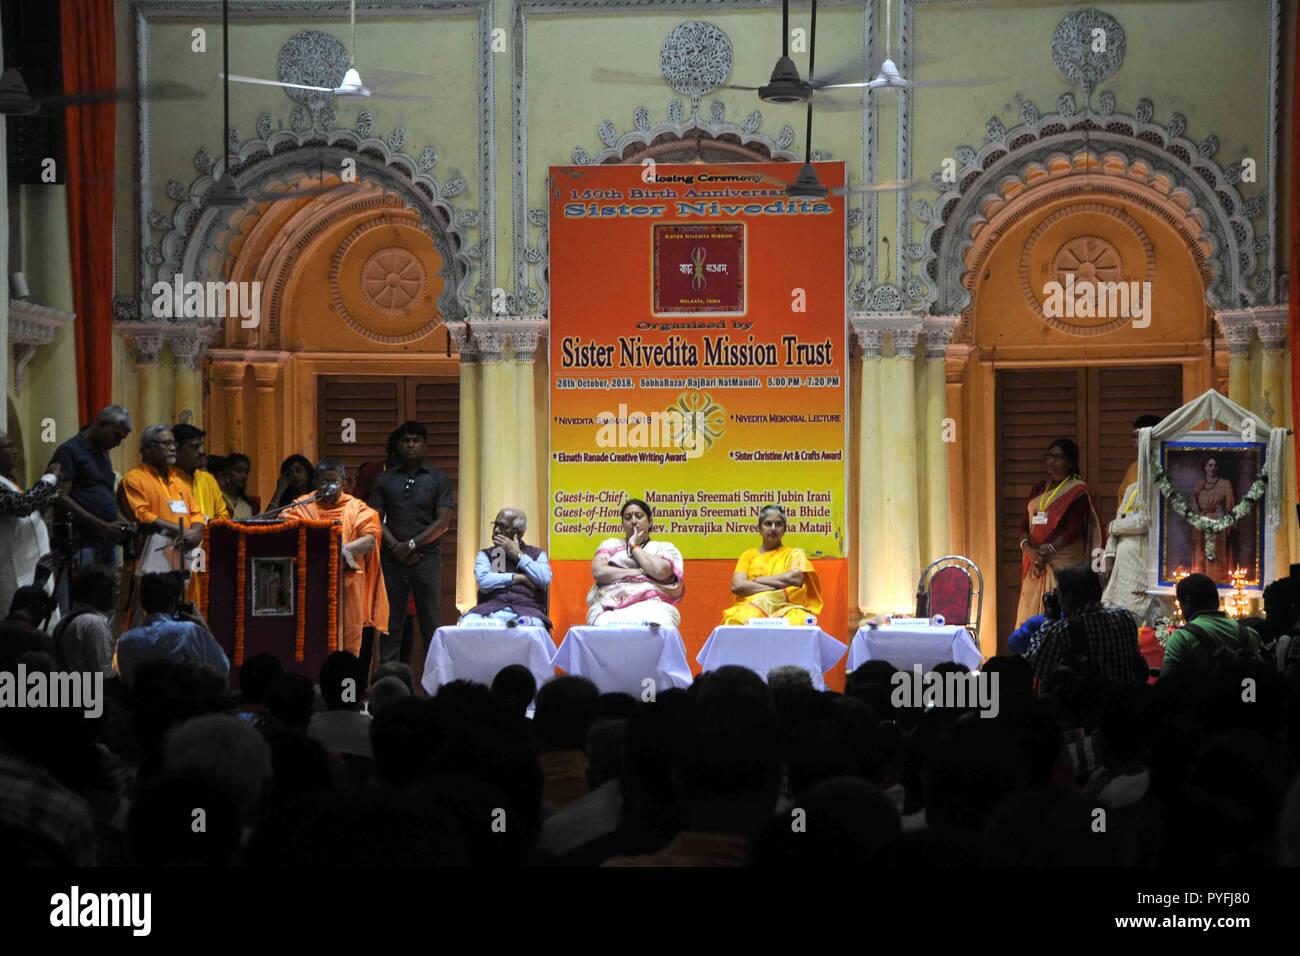 Kolkata, India. 26th Oct, 2018. Union Textile Minister Smriti Irani (middle) takes part in the inauguration of Sister Nivedita Memorial Lecture at Sovabazaar Rajbari. Credit: Saikat Paul/Pacific Press/Alamy Live News - Stock Image